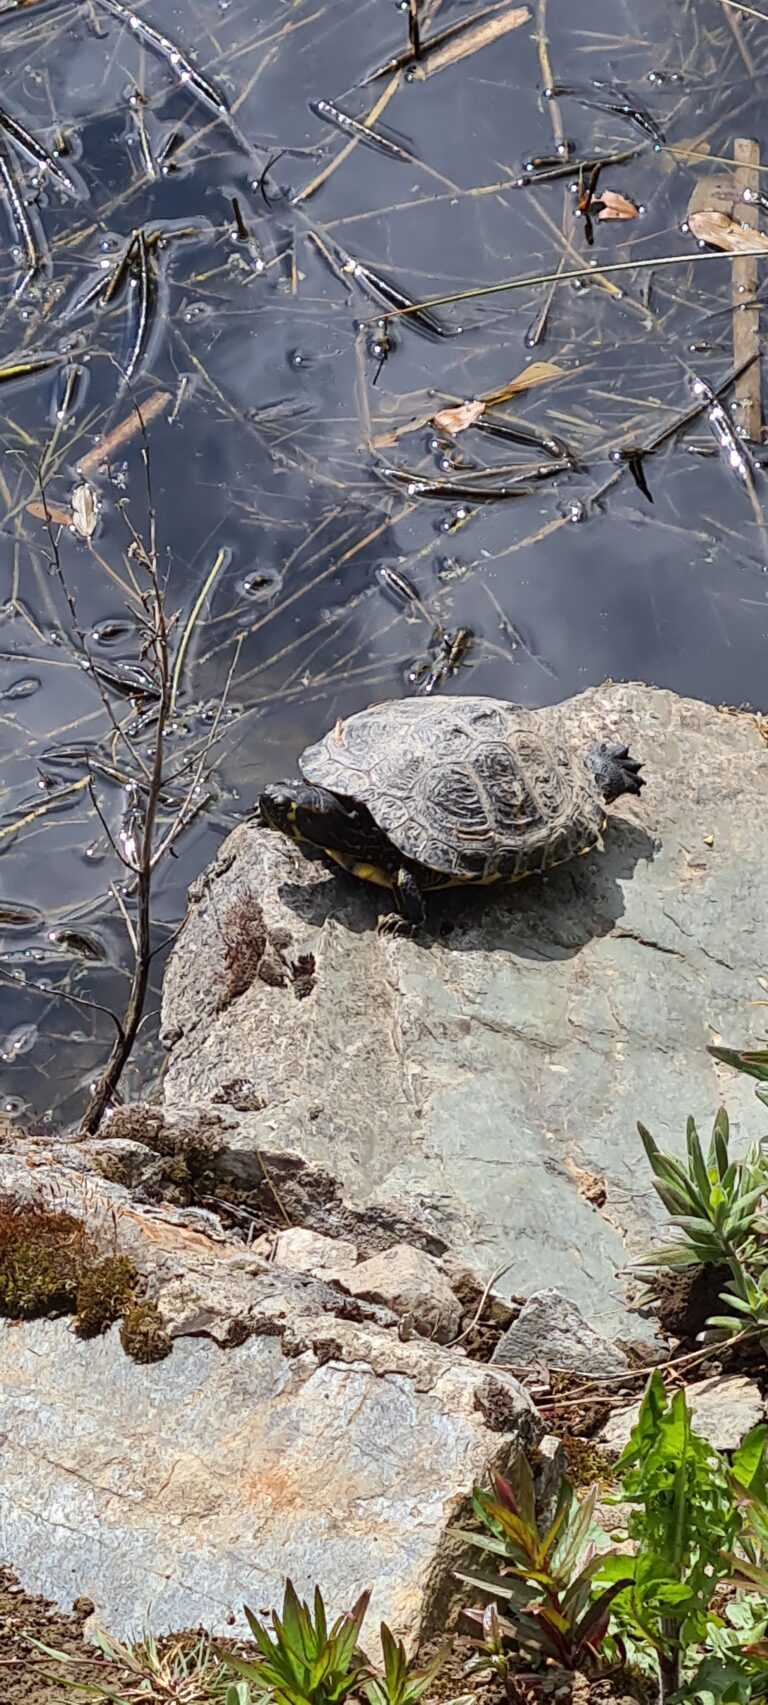 Turtle Saggart